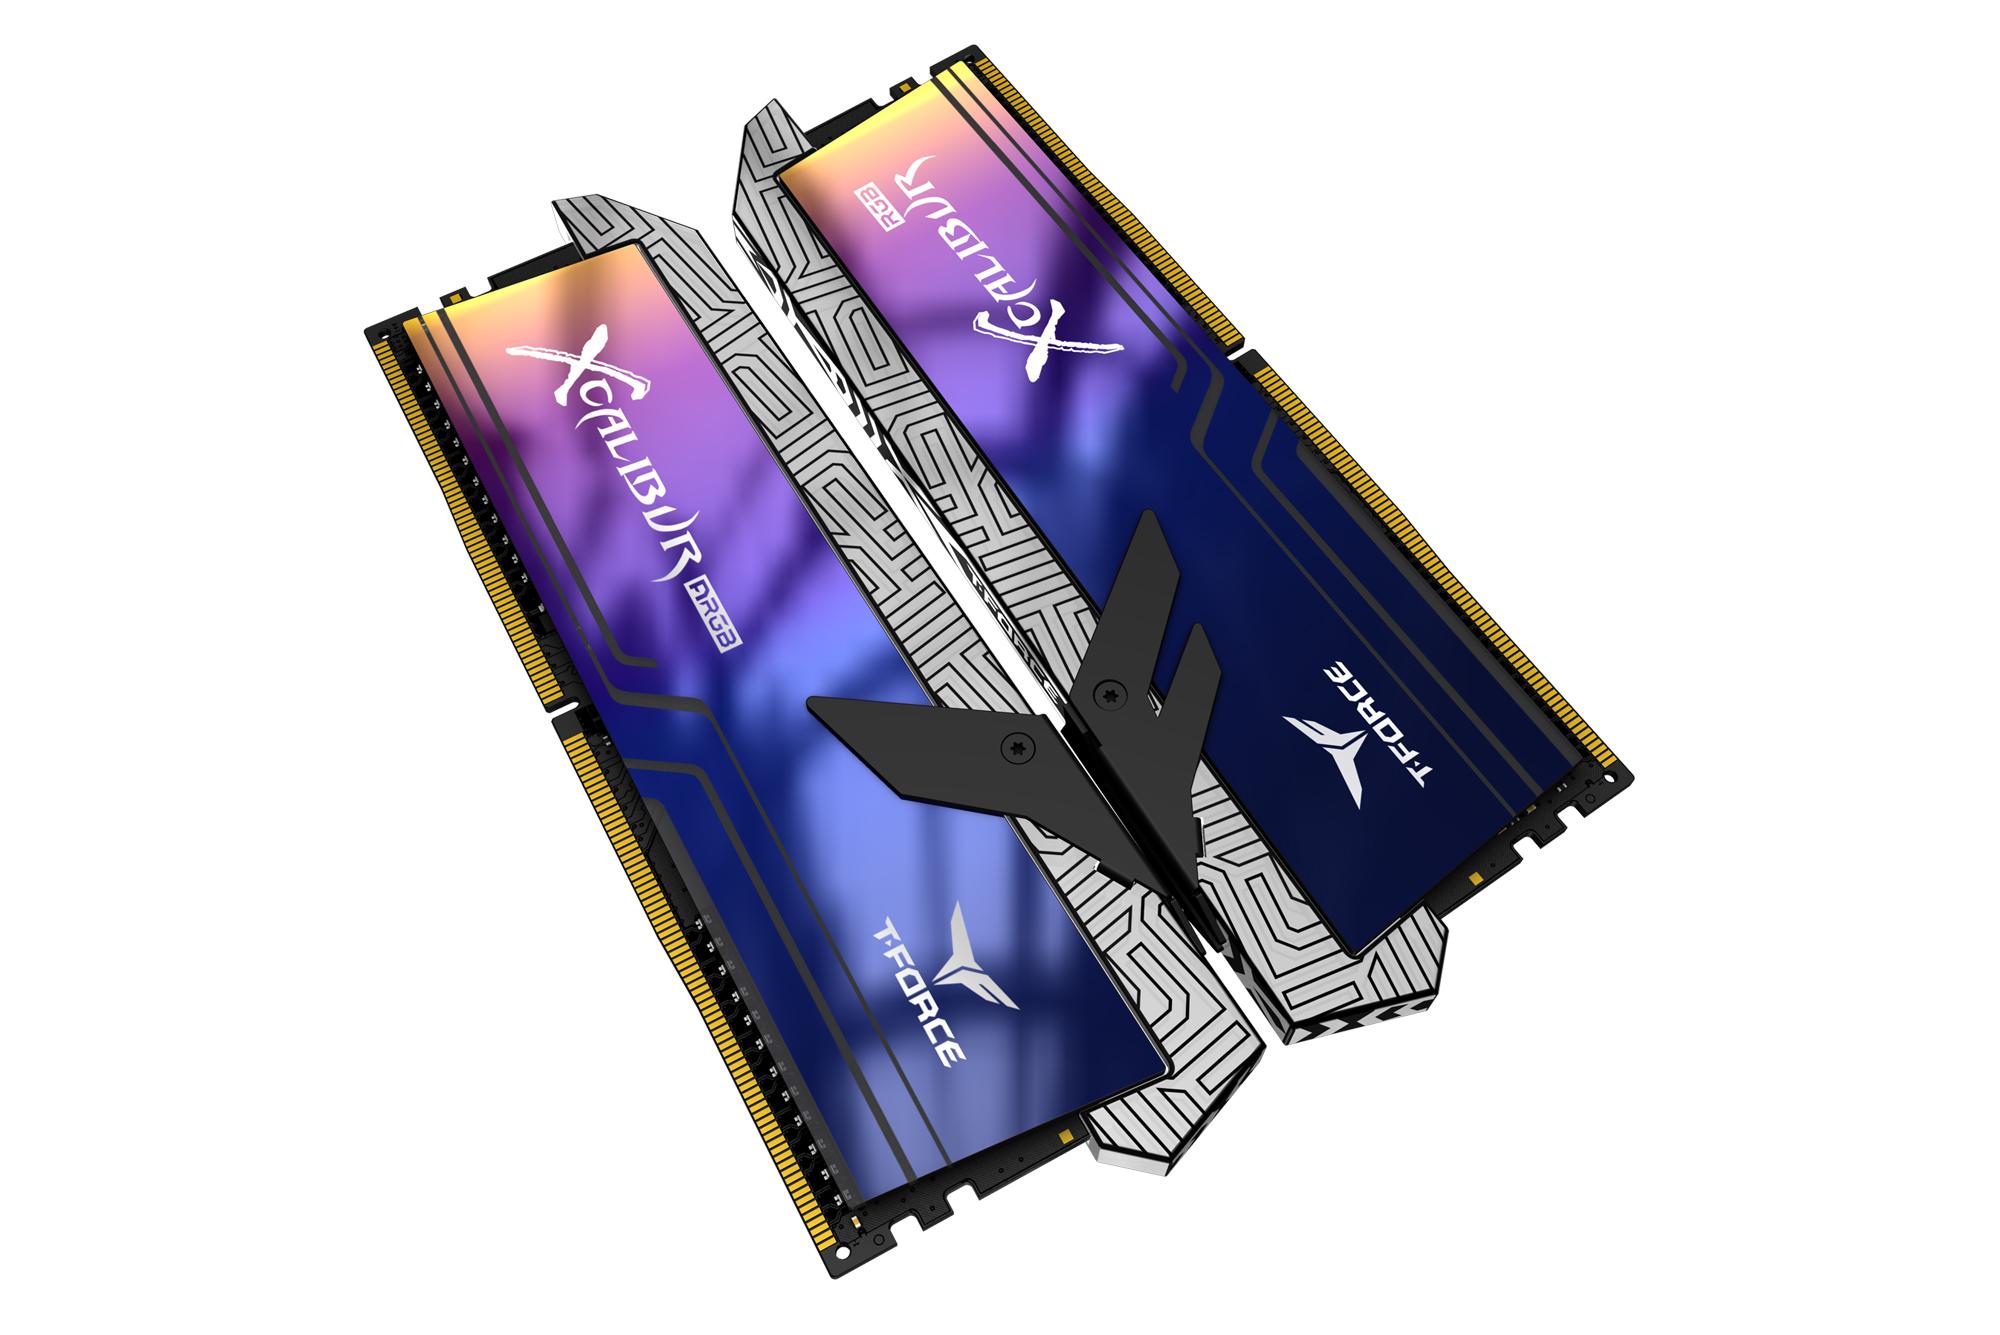 T-FORCE XCALIBUR RGB DDR4